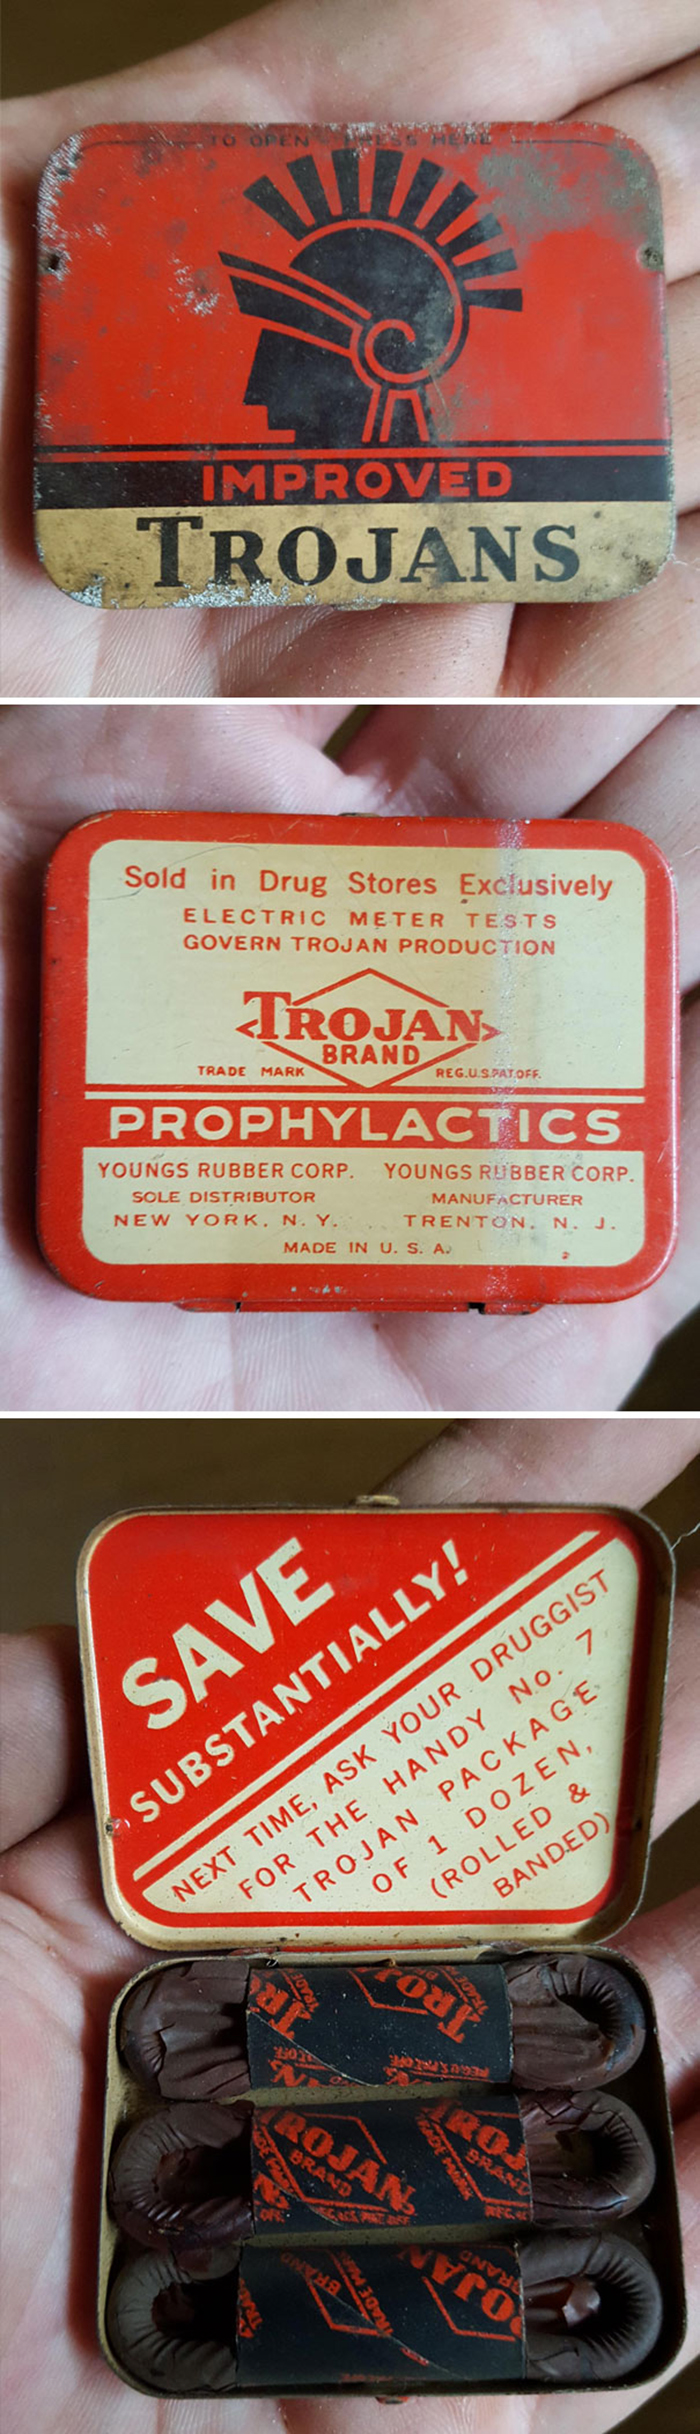 unusual discoveries vintage condoms